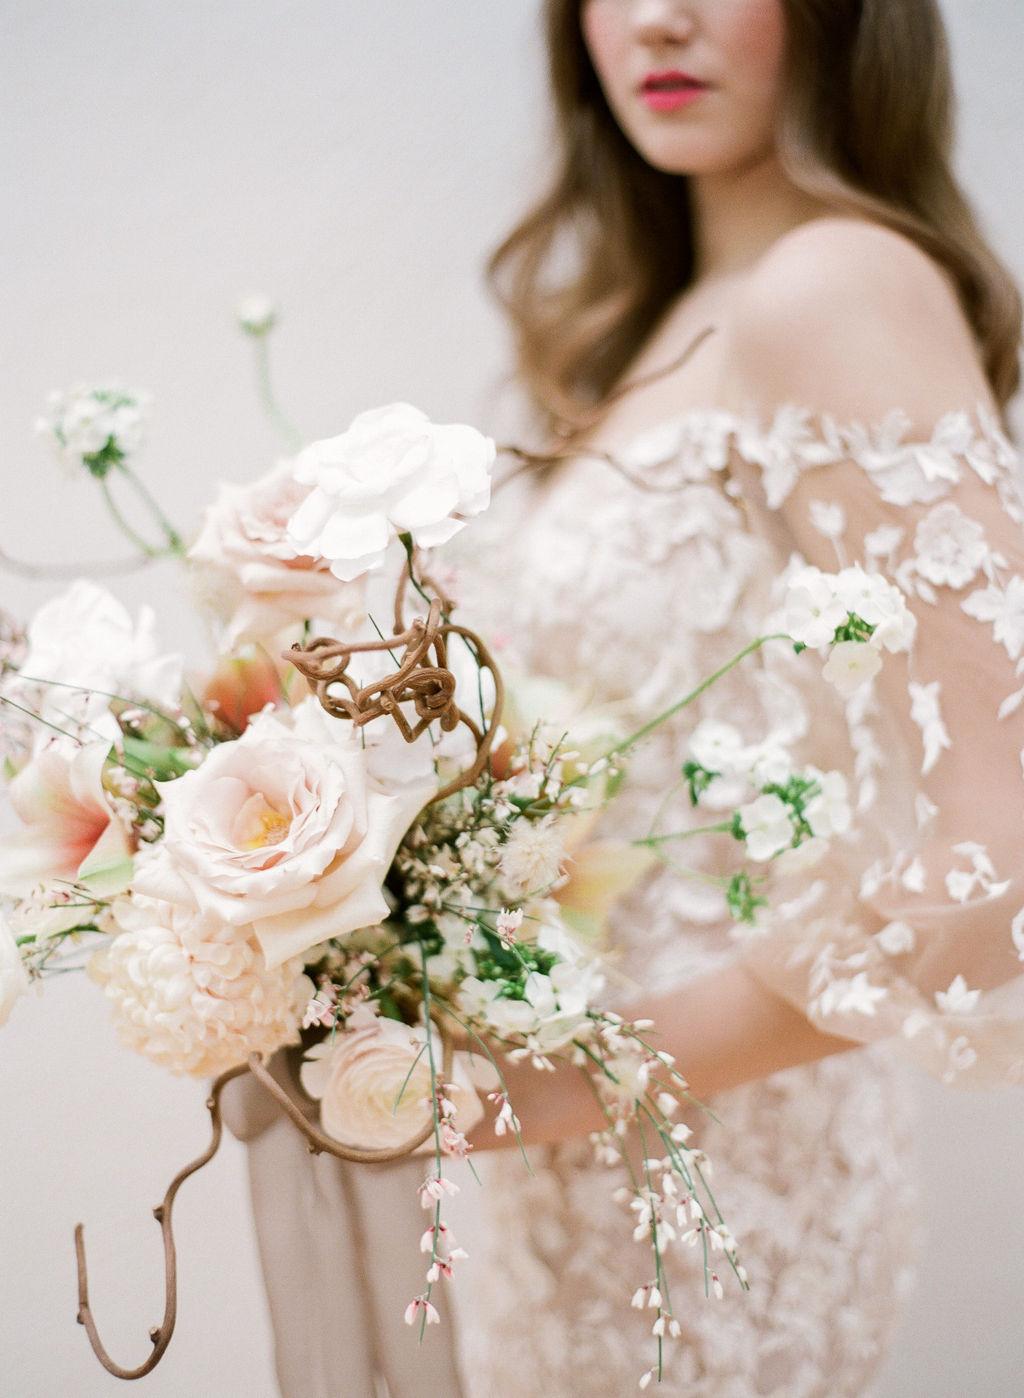 artiese-ago-wedding-editorial-000423700014.jpg